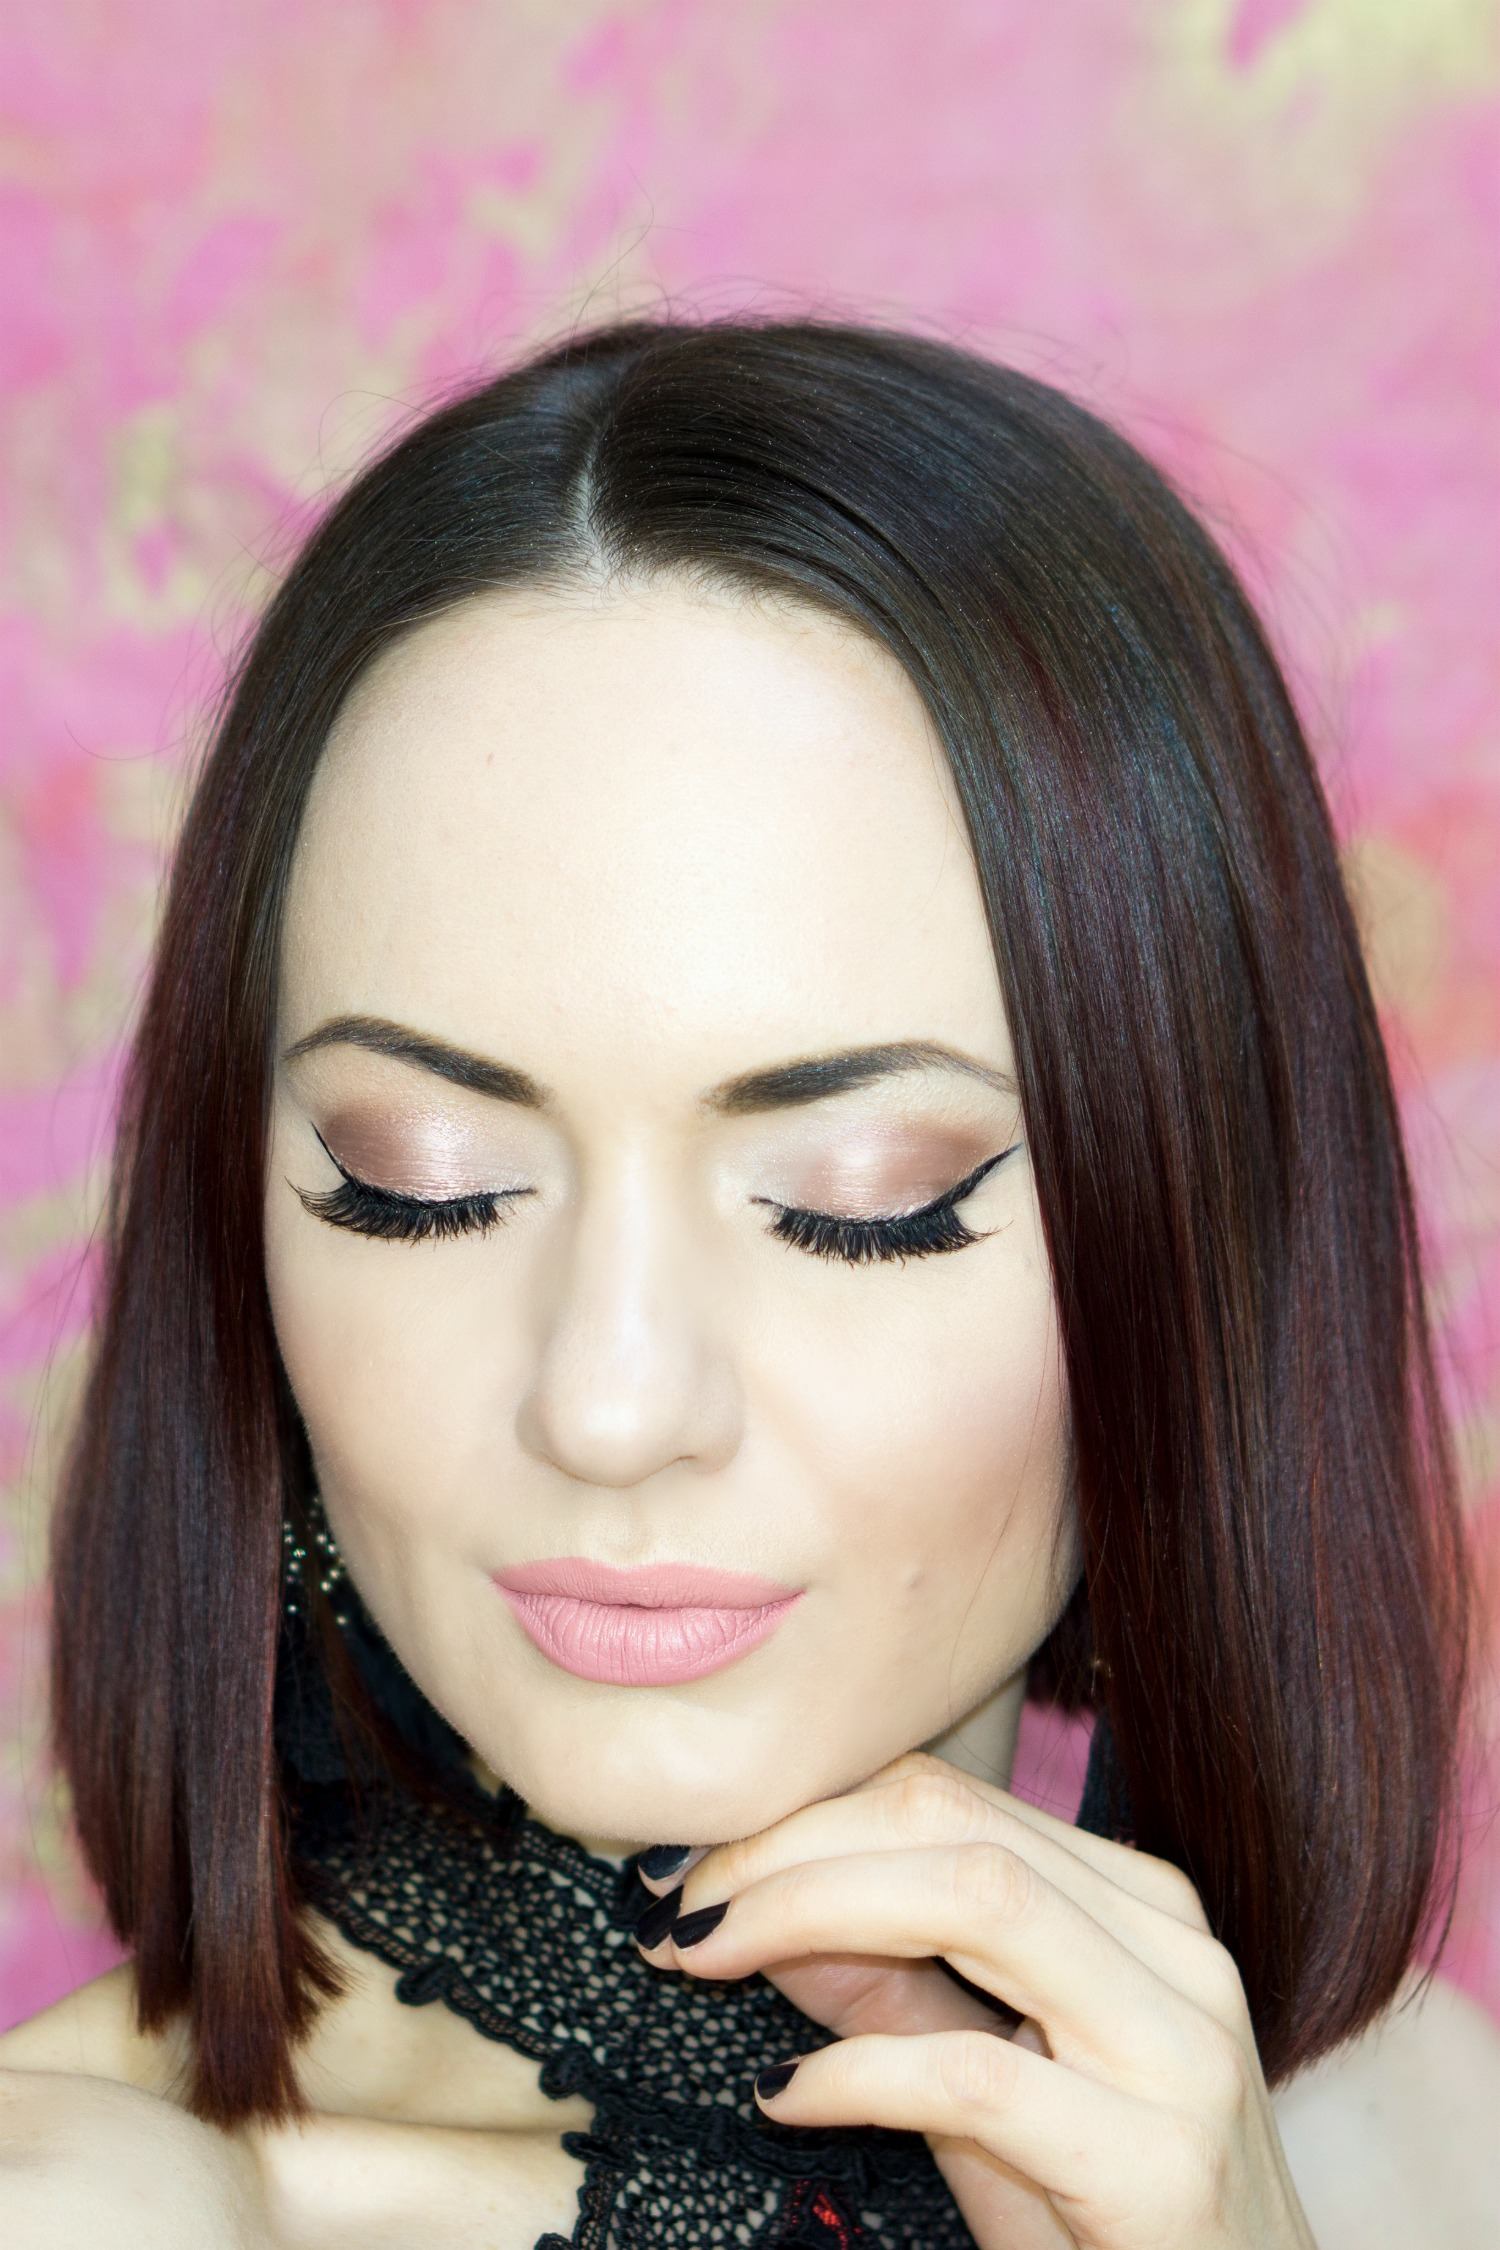 Makeup Tutorial Using 21 Days of Beauty Deals 2